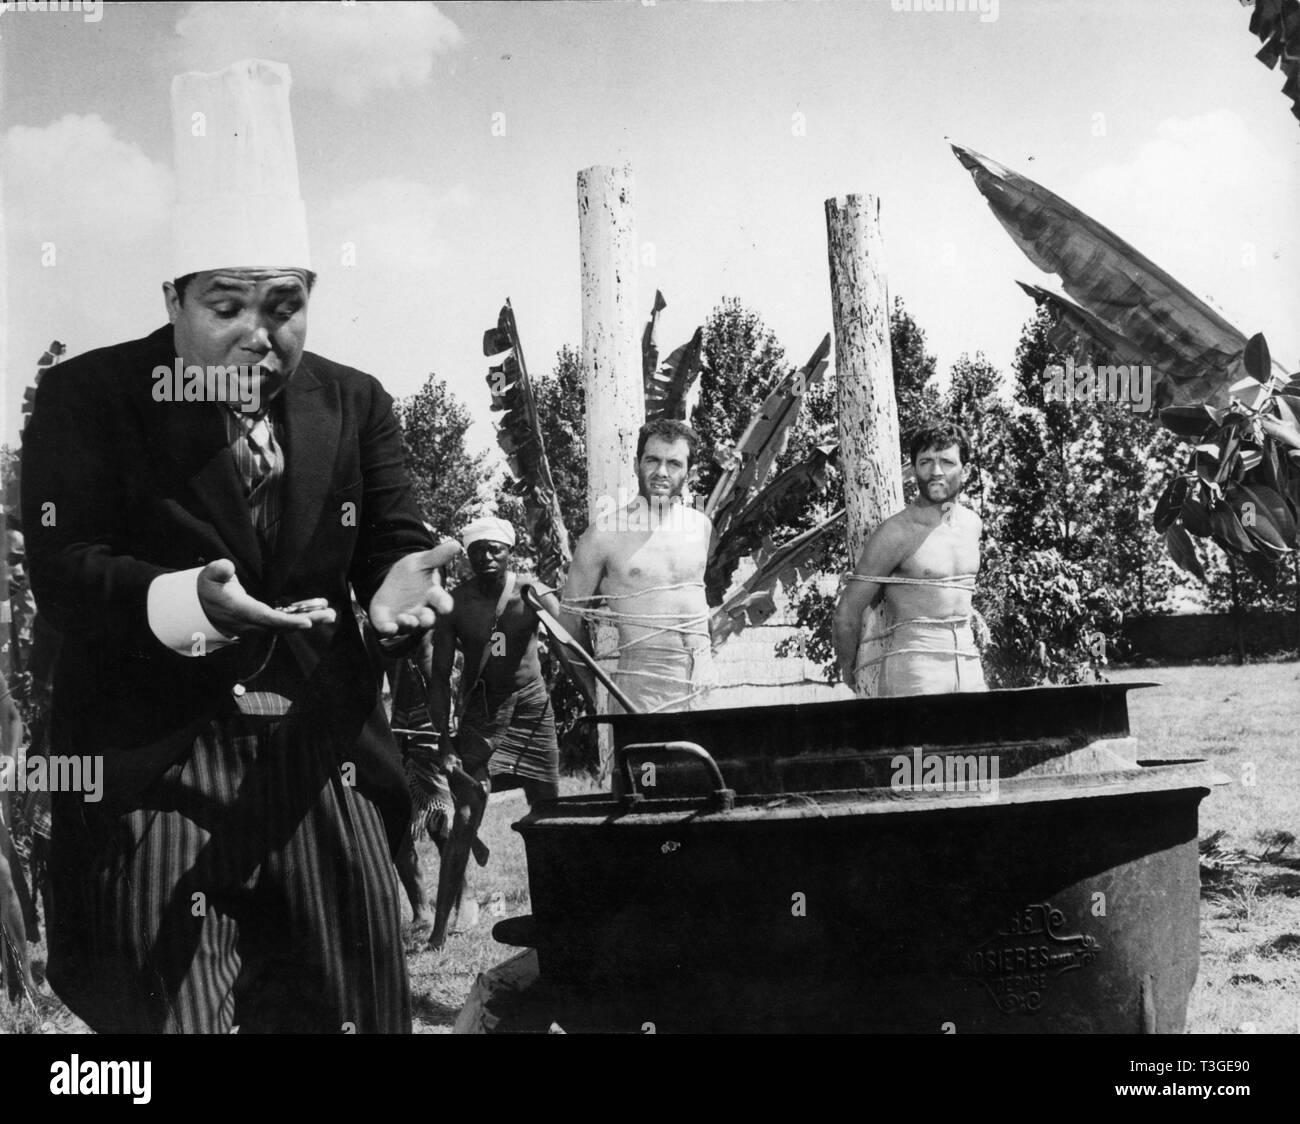 Candide ou l'optimisme au XXe siecle  Year: 1961 - France Jean-Pierre Cassel, Jacques Balutin  Director: Norbert Carbonnaux - Stock Image